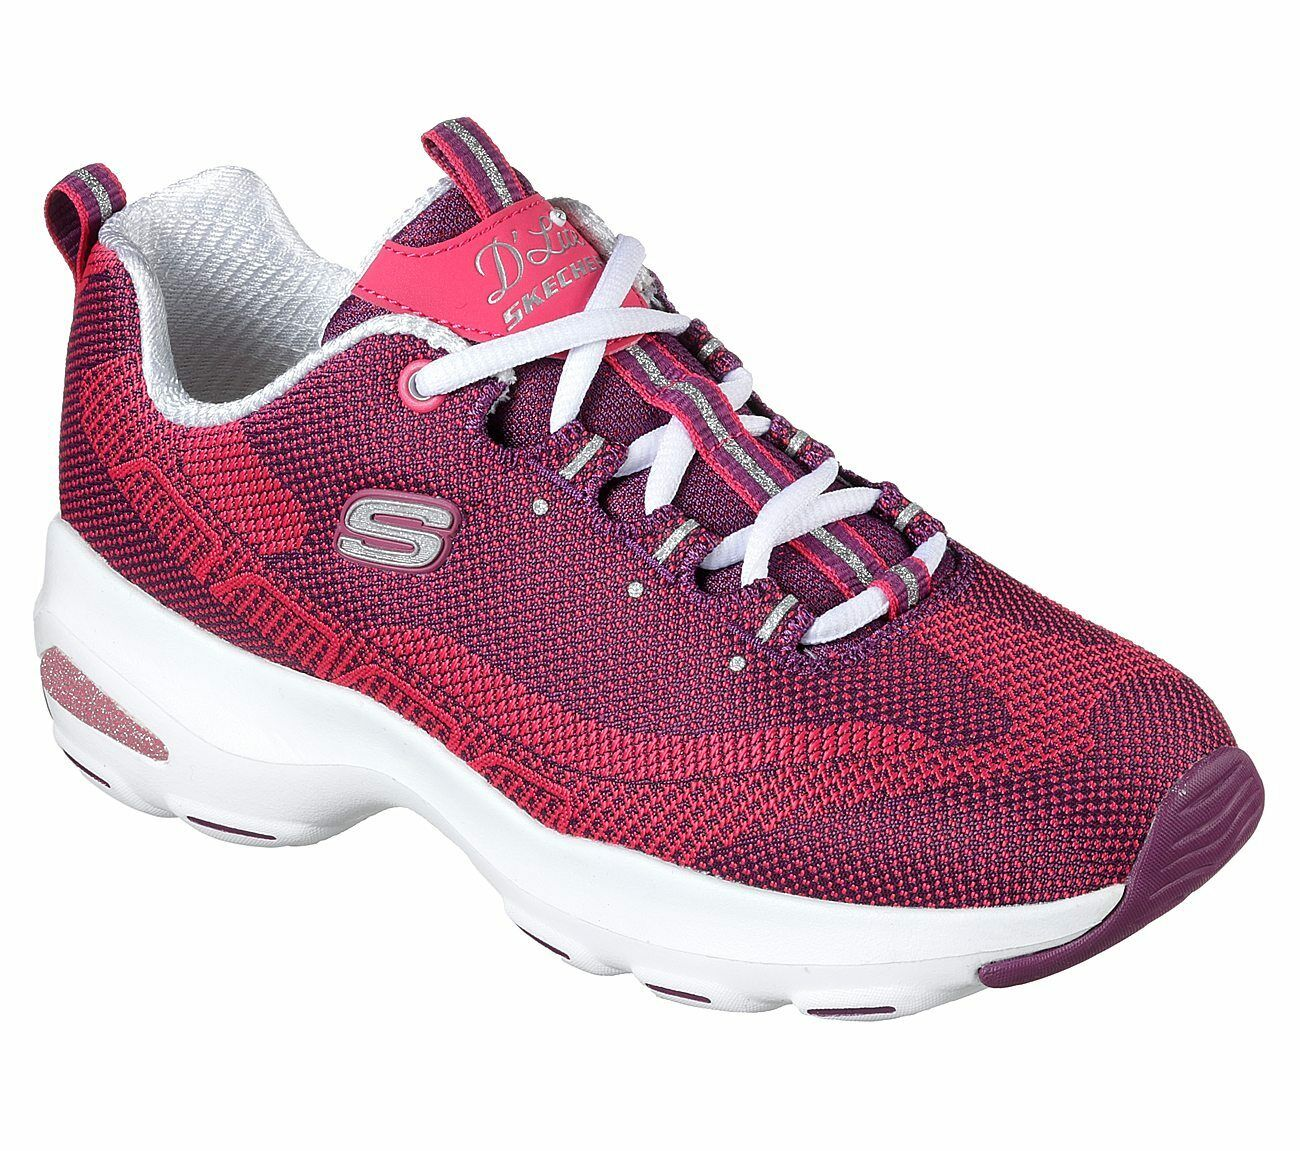 Skechers D'Lites Ultra Trainers Knit Donna Memory Foam Chunky Knit Trainers Scarpe da Ginnastica Shoes 4c90d9